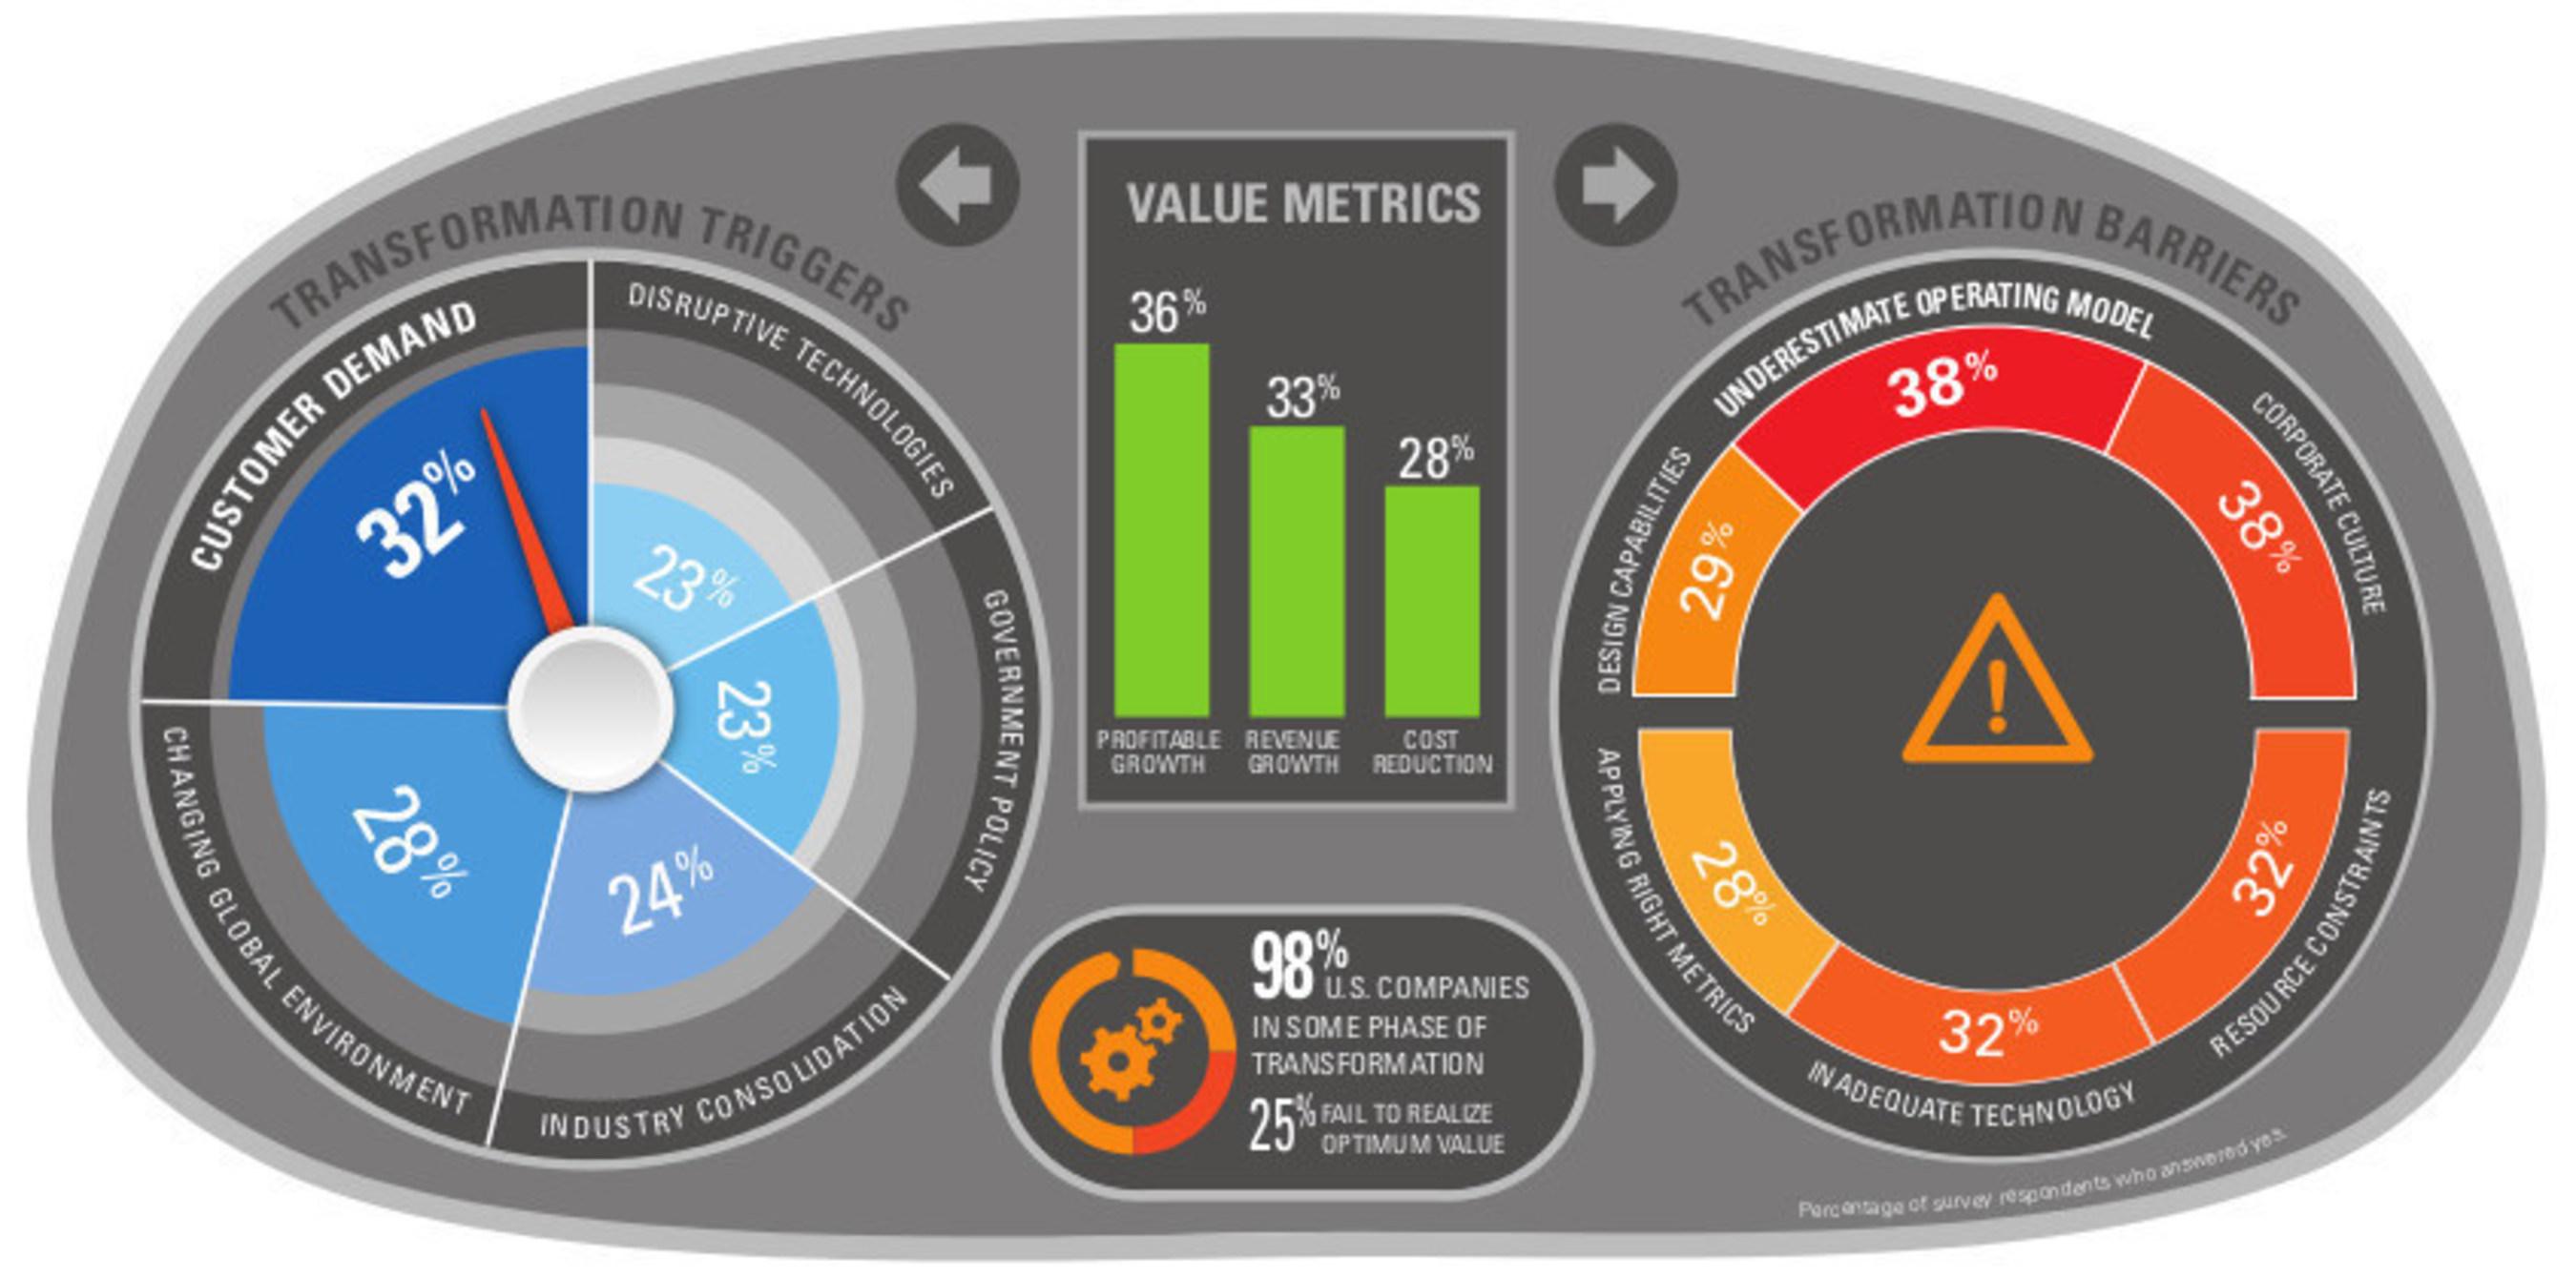 KPMG 2015 Business Transformation Survey